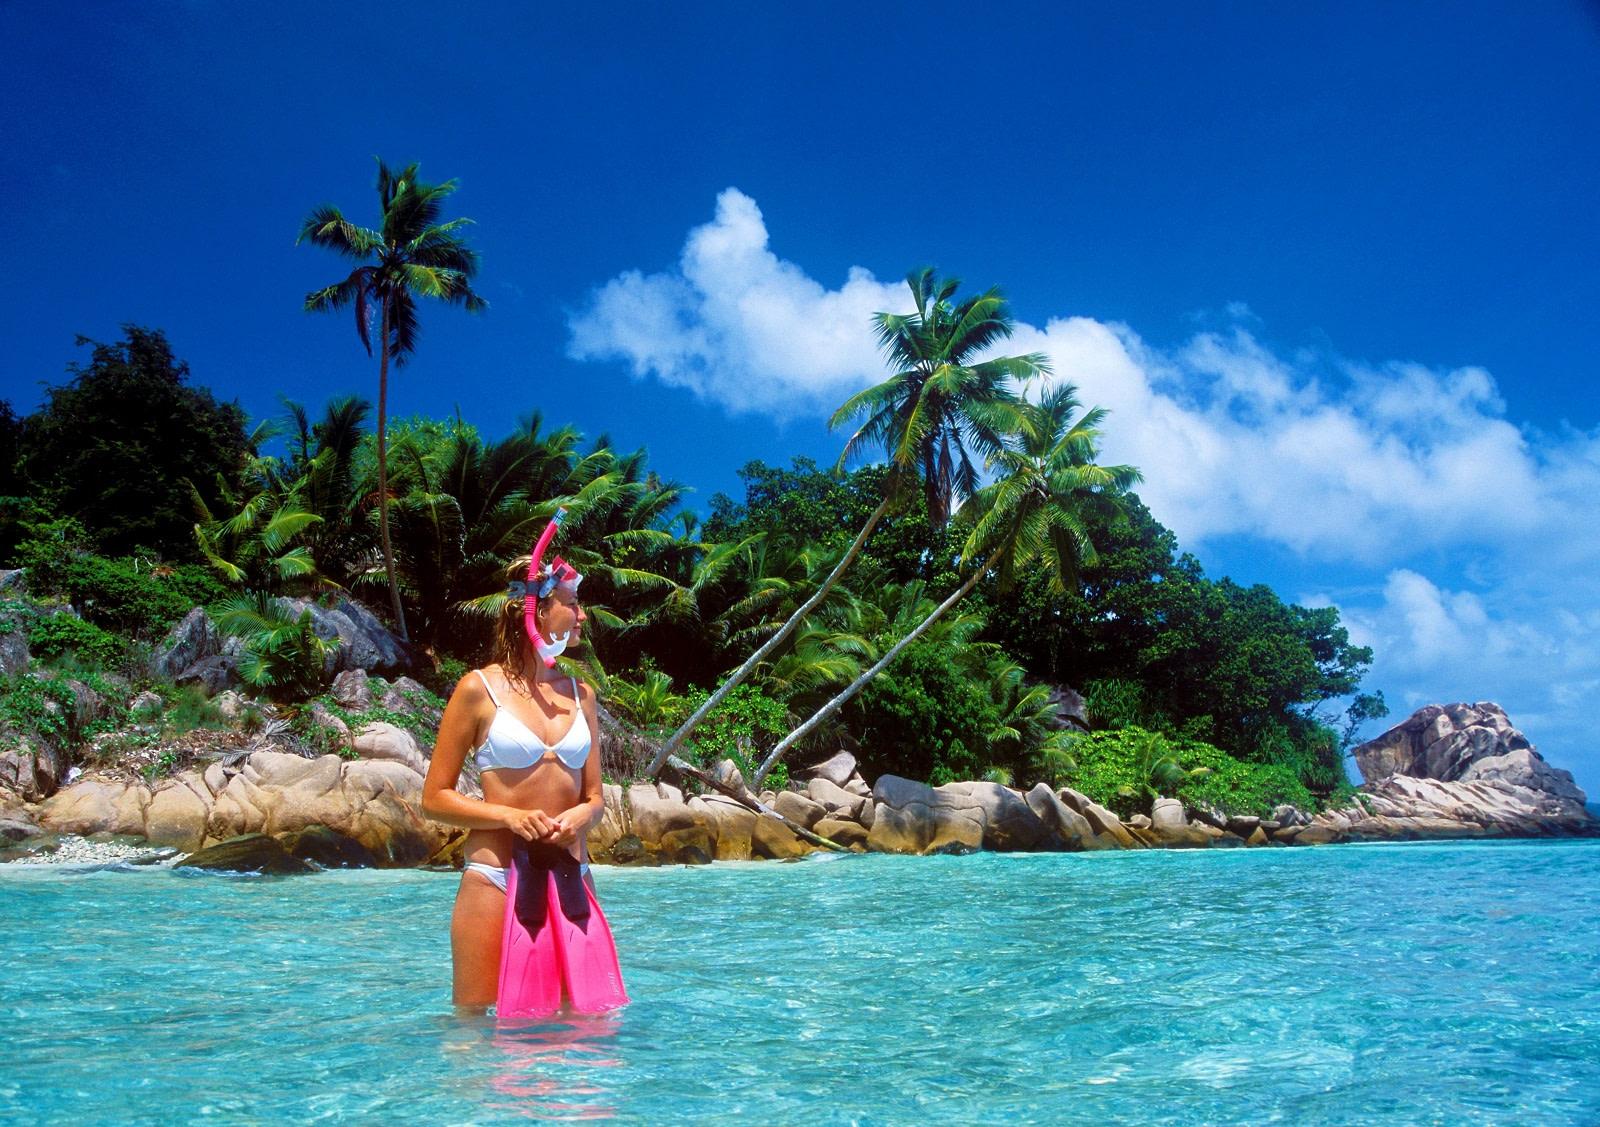 snorkeling at seychelles islands